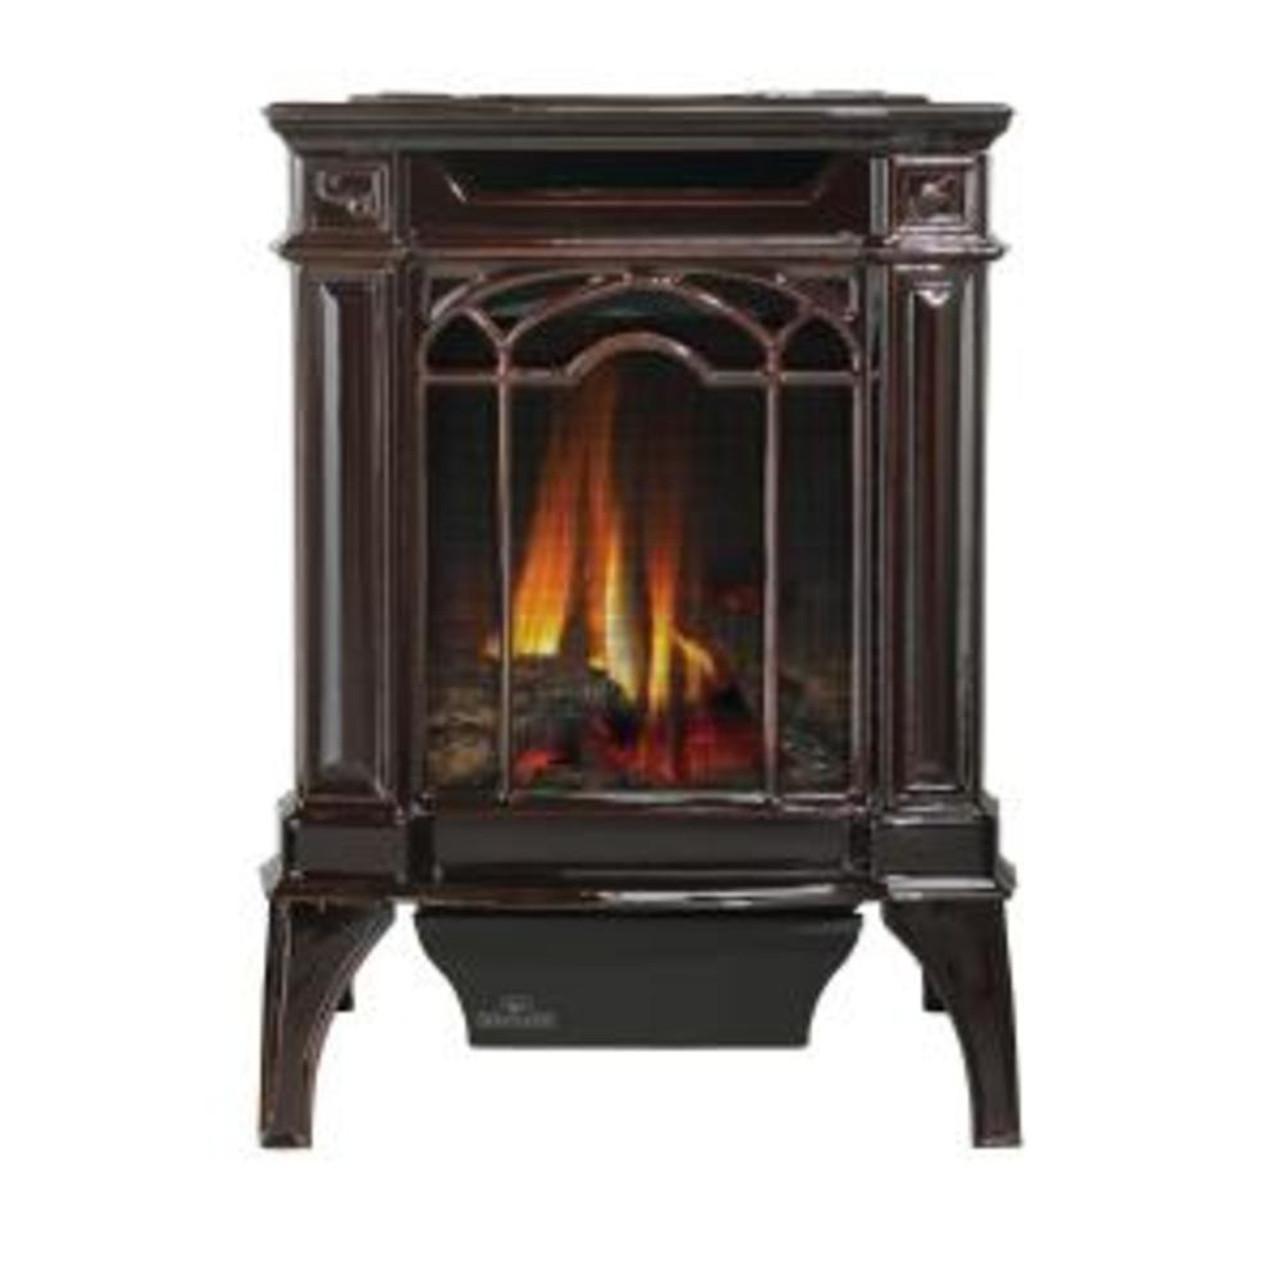 Napoleon Arlington Cast Iron Direct Vent Gas Fireplace